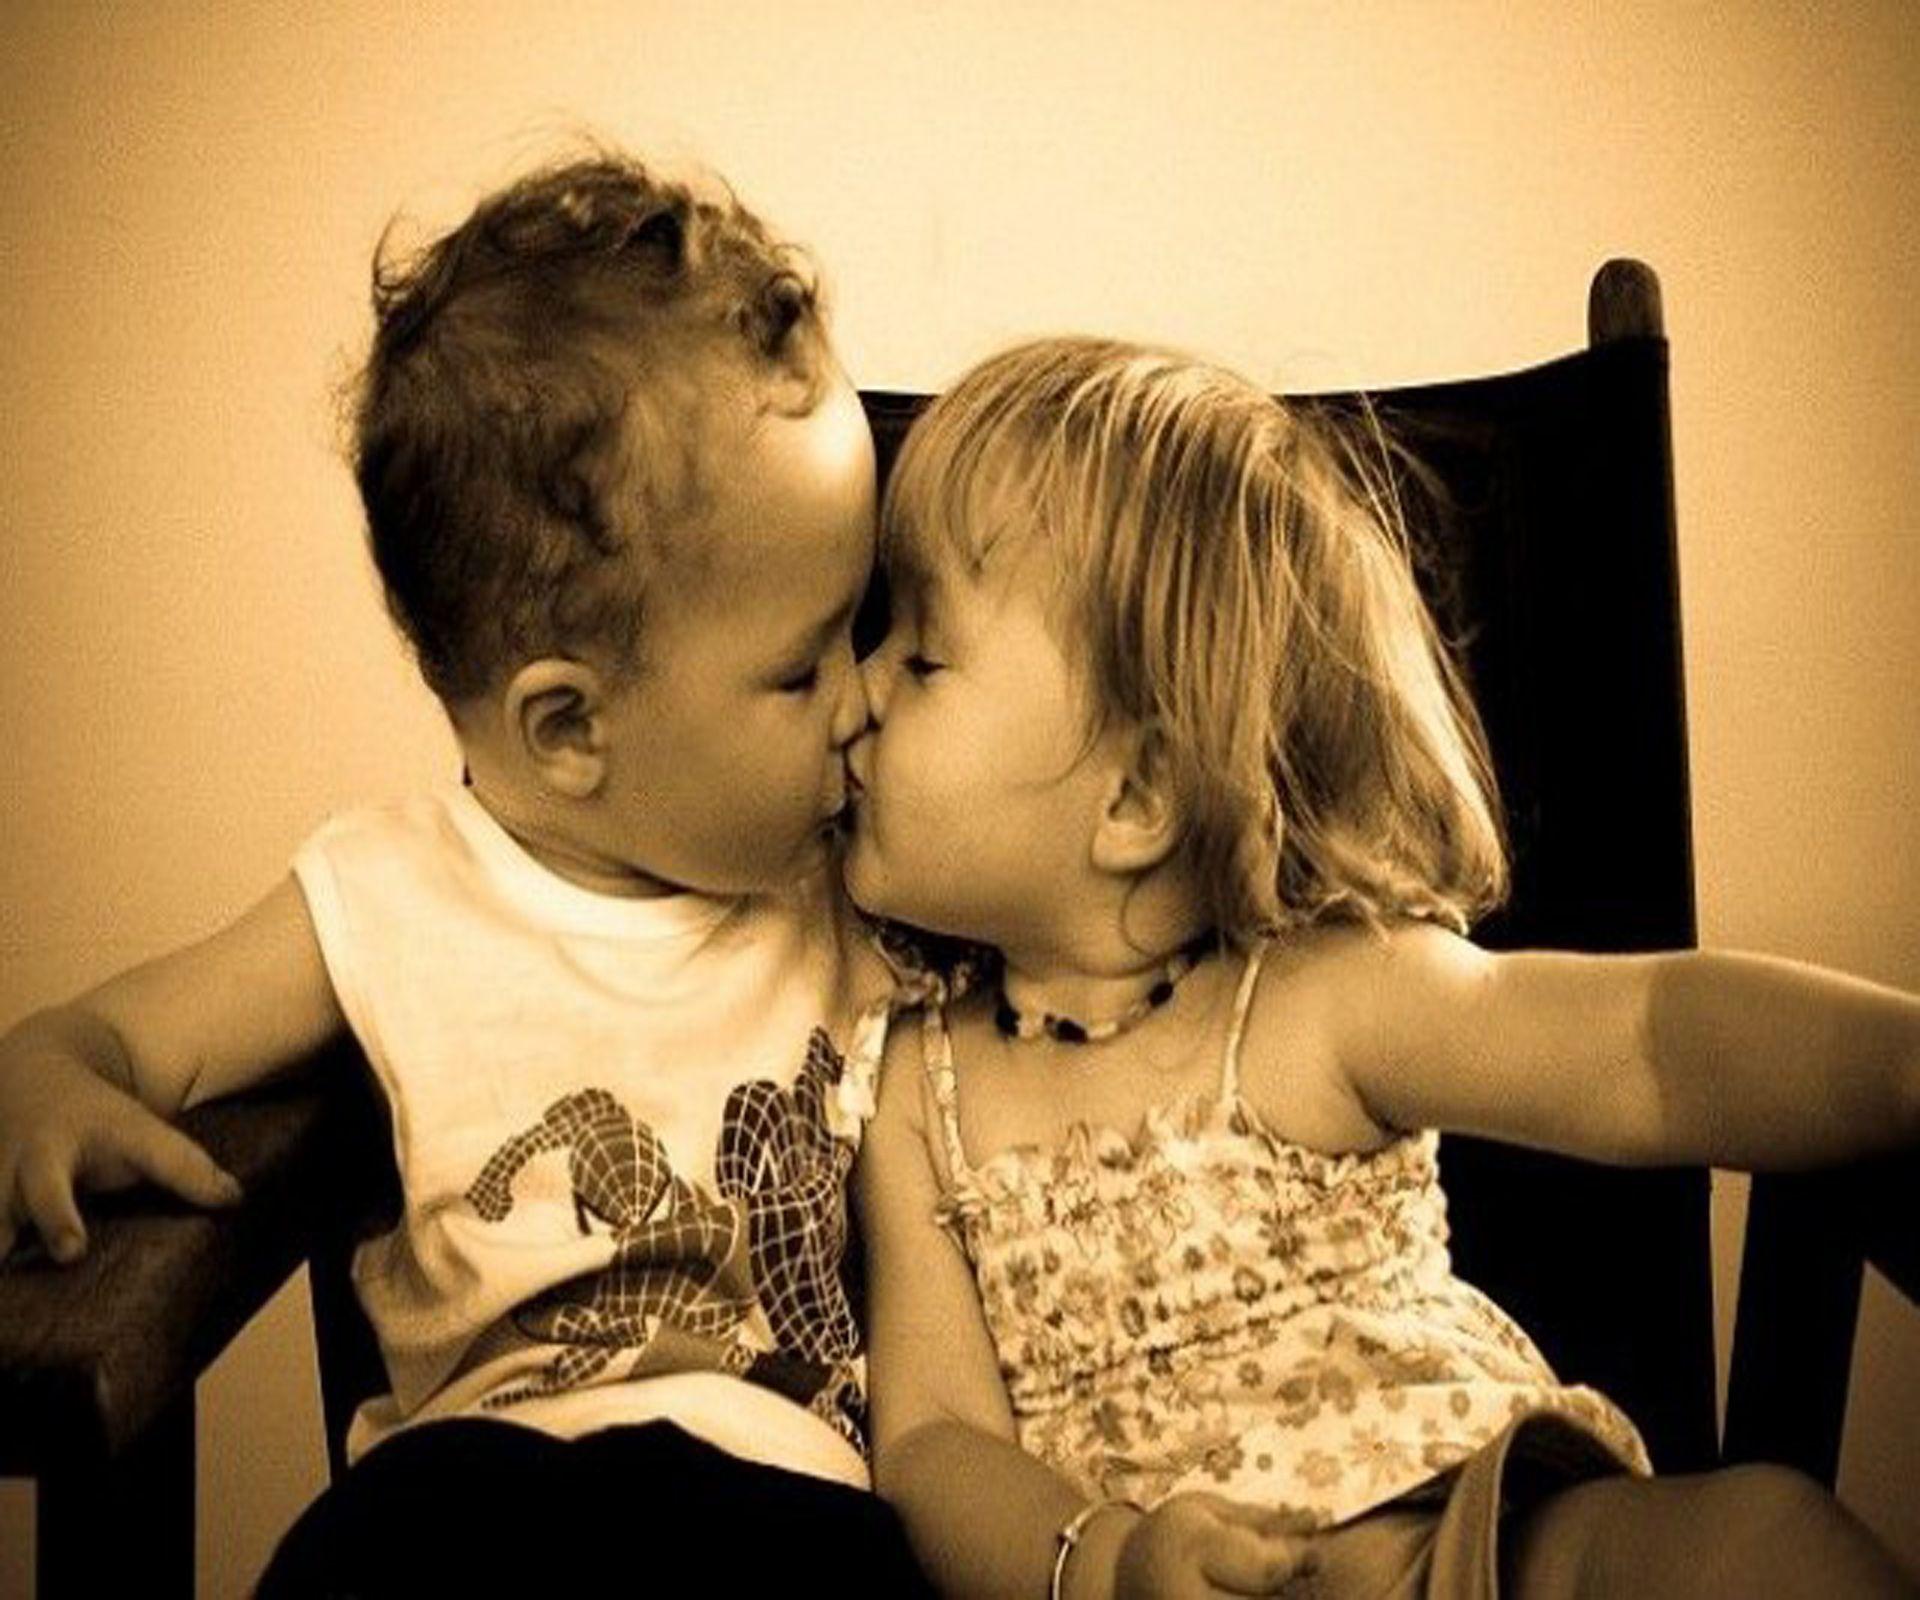 Картинки девочка целует мальчика в носик, марта